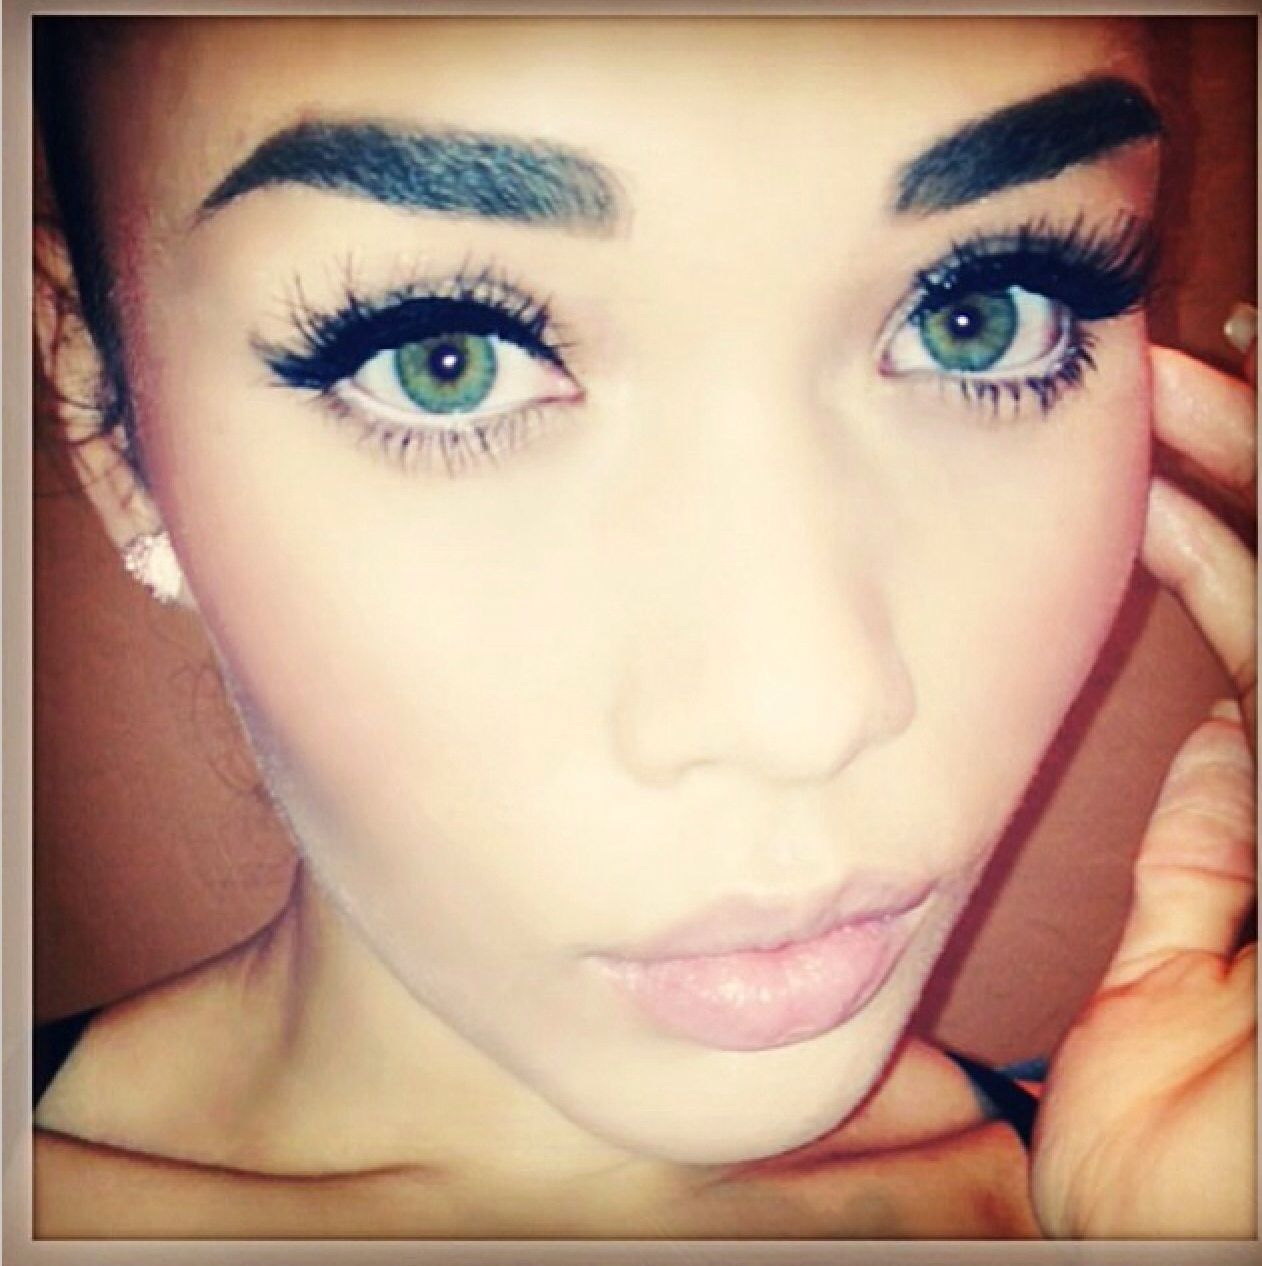 Thick black eyeliner upper lid, white eyeliner on waterline ...